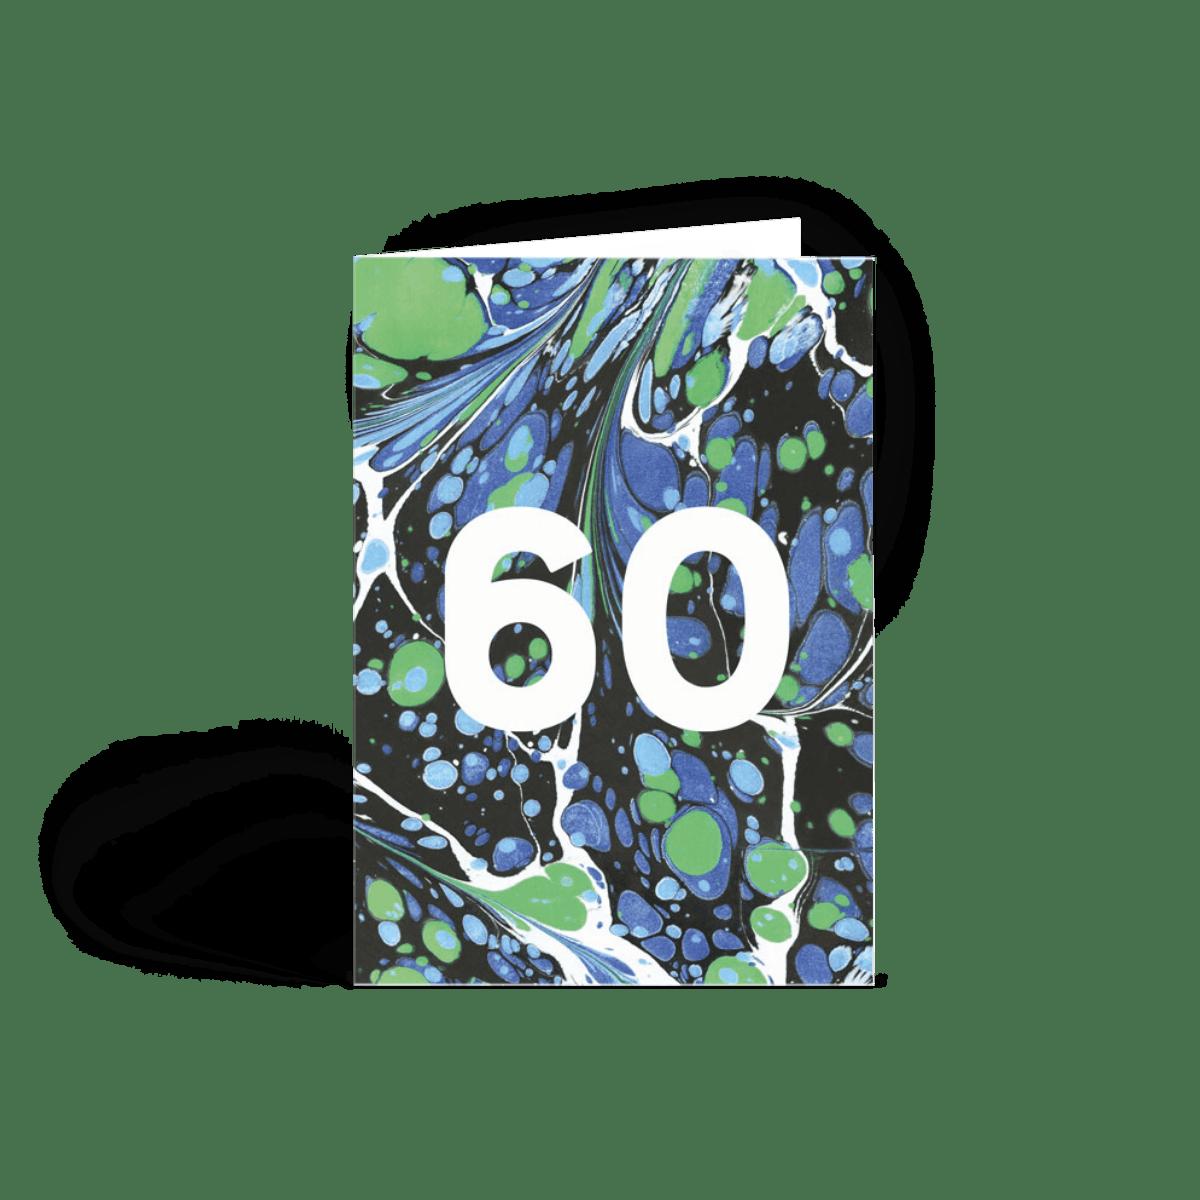 piscine lunar 60th  60th birthday card  papier